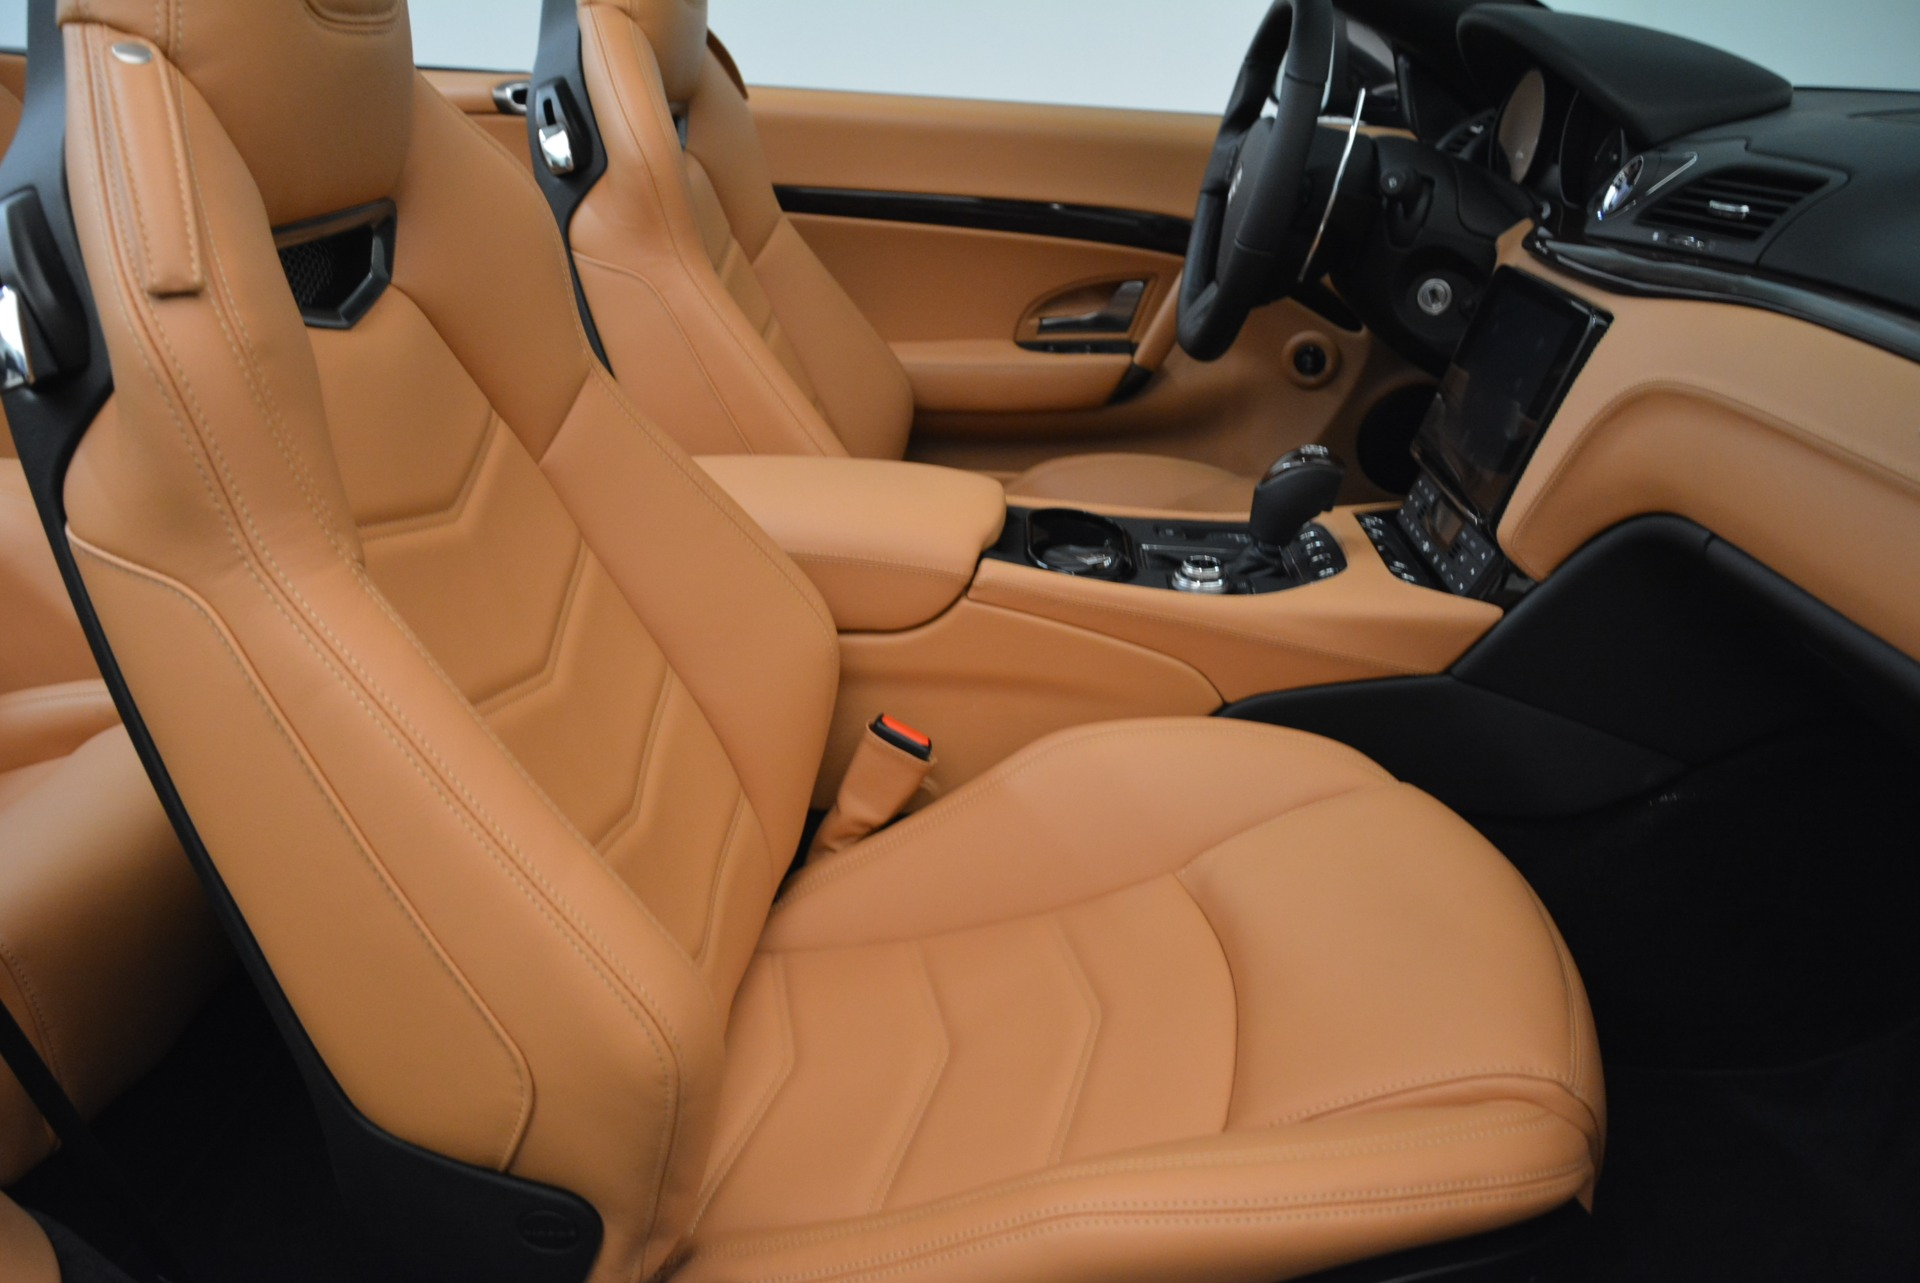 Used 2018 Maserati GranTurismo Sport Convertible For Sale In Westport, CT 1865_p32